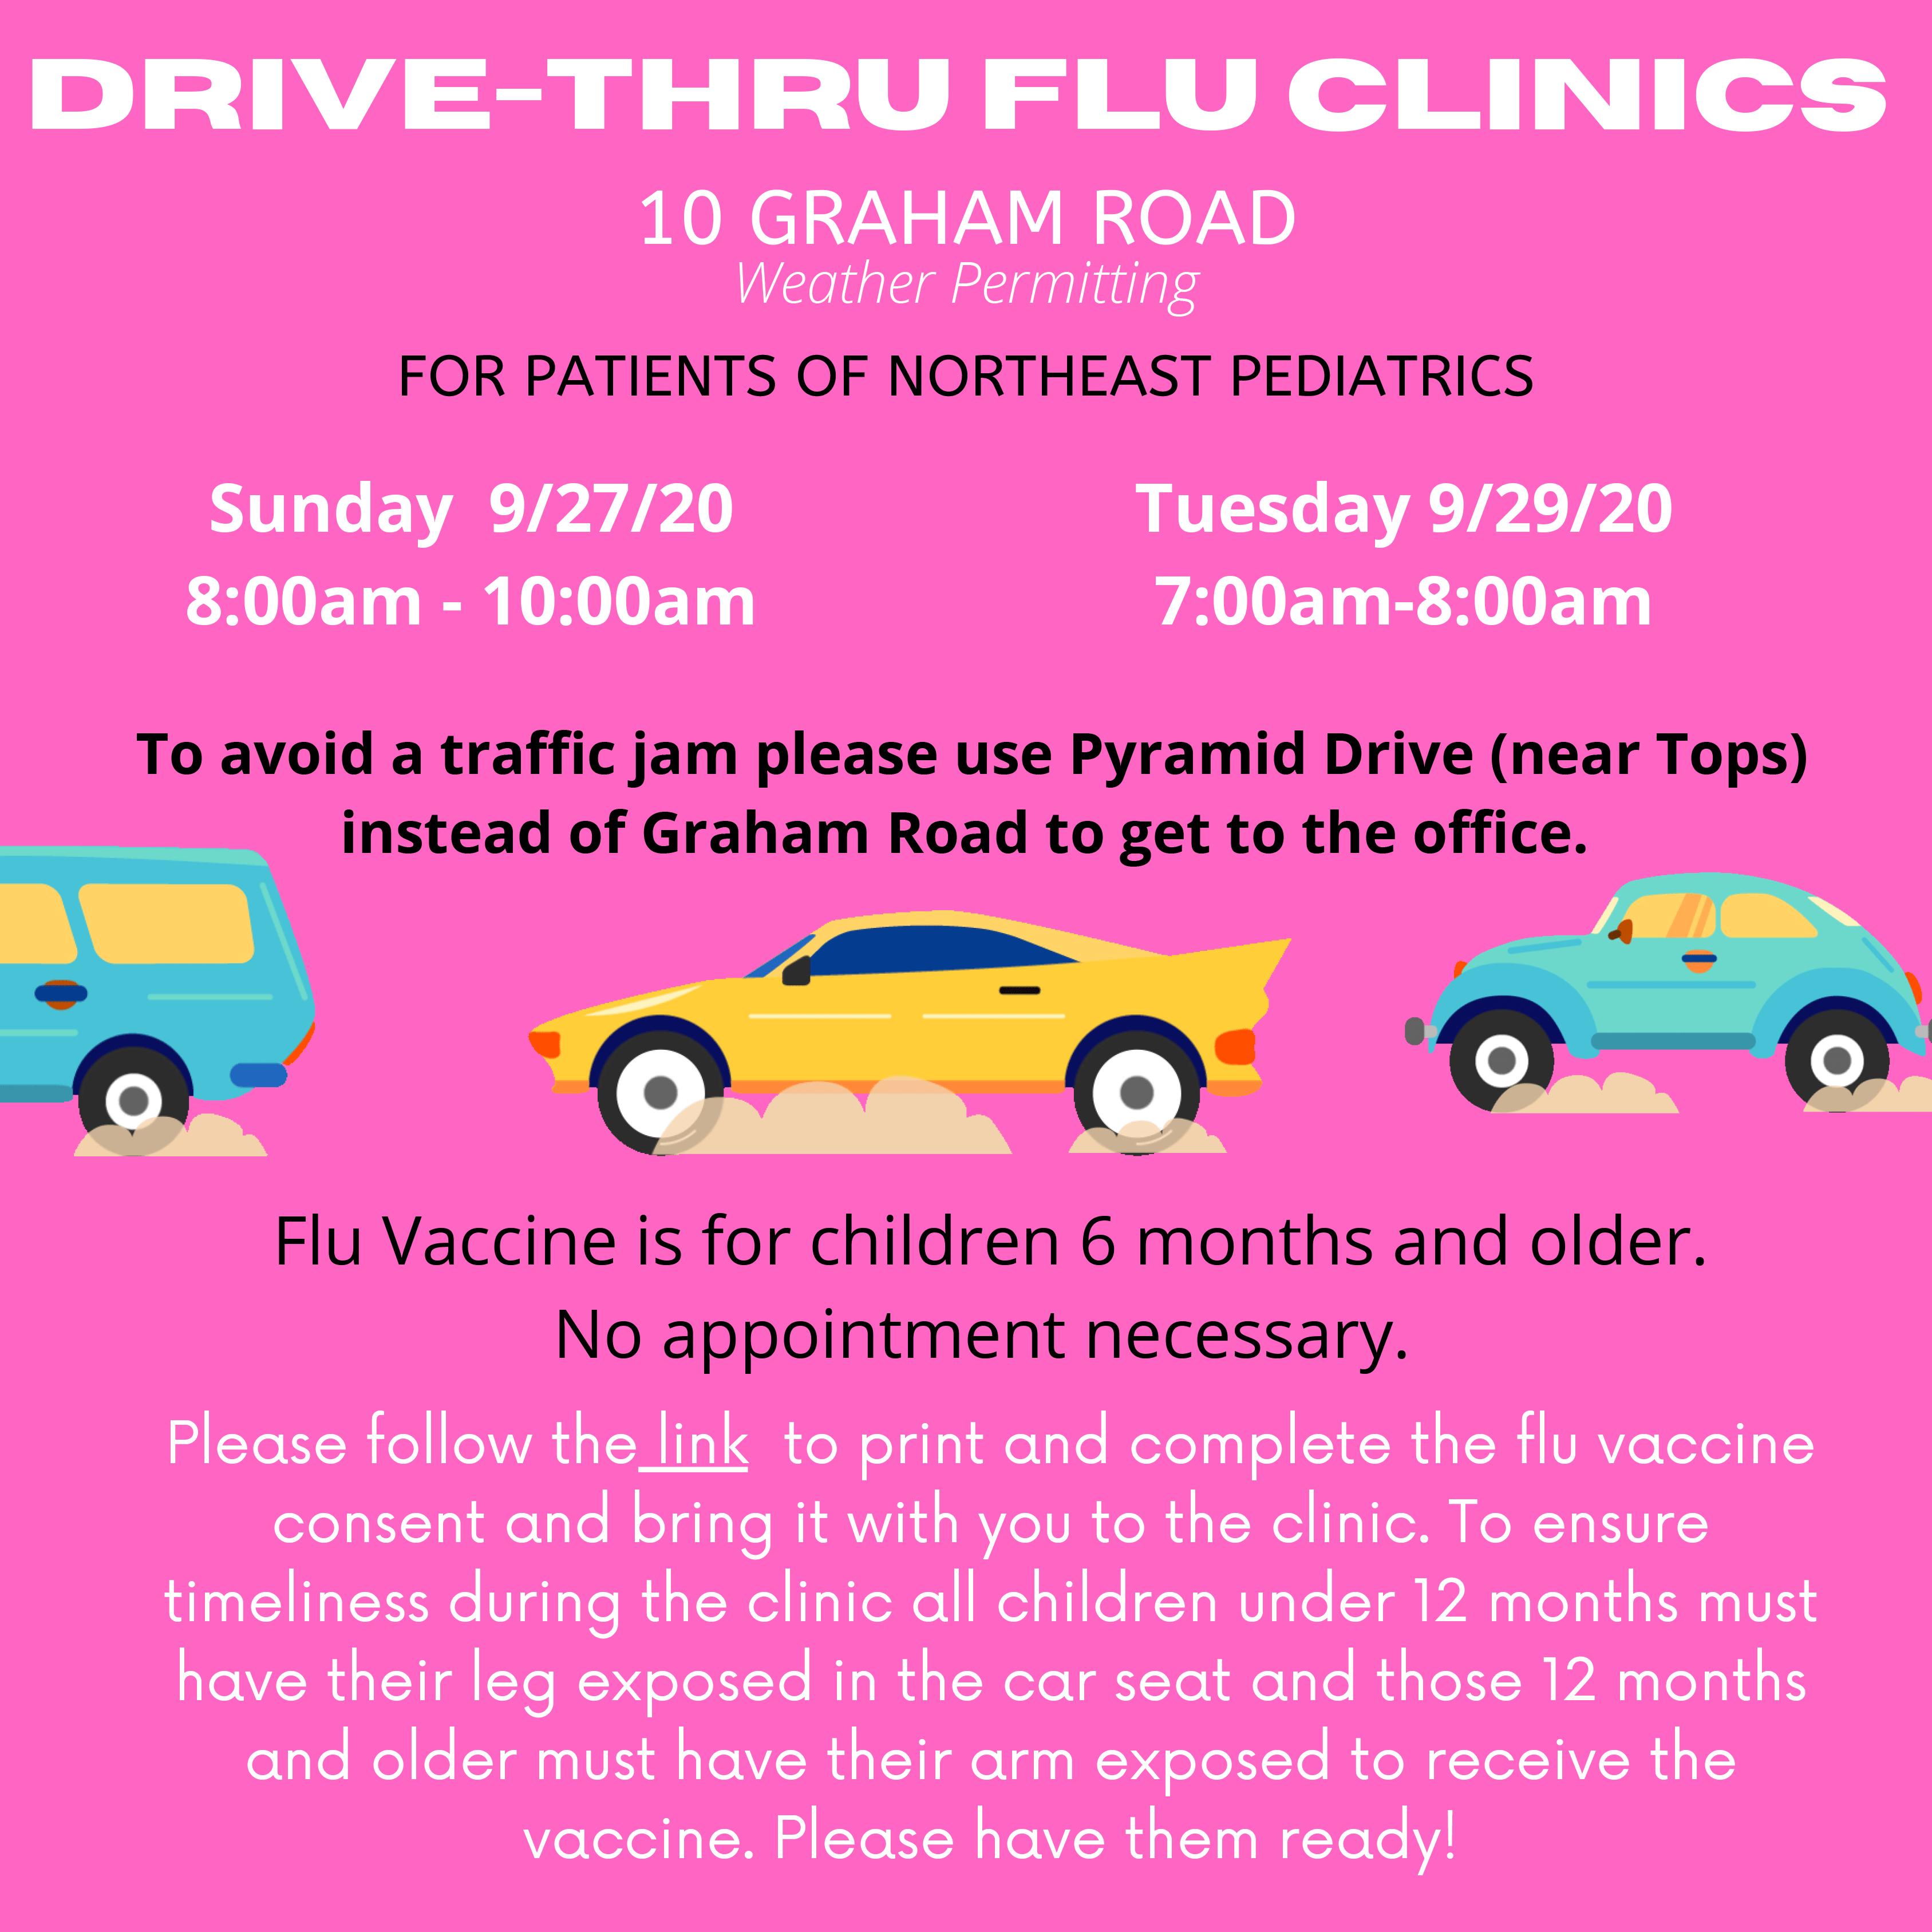 drive thru flu late september - Home